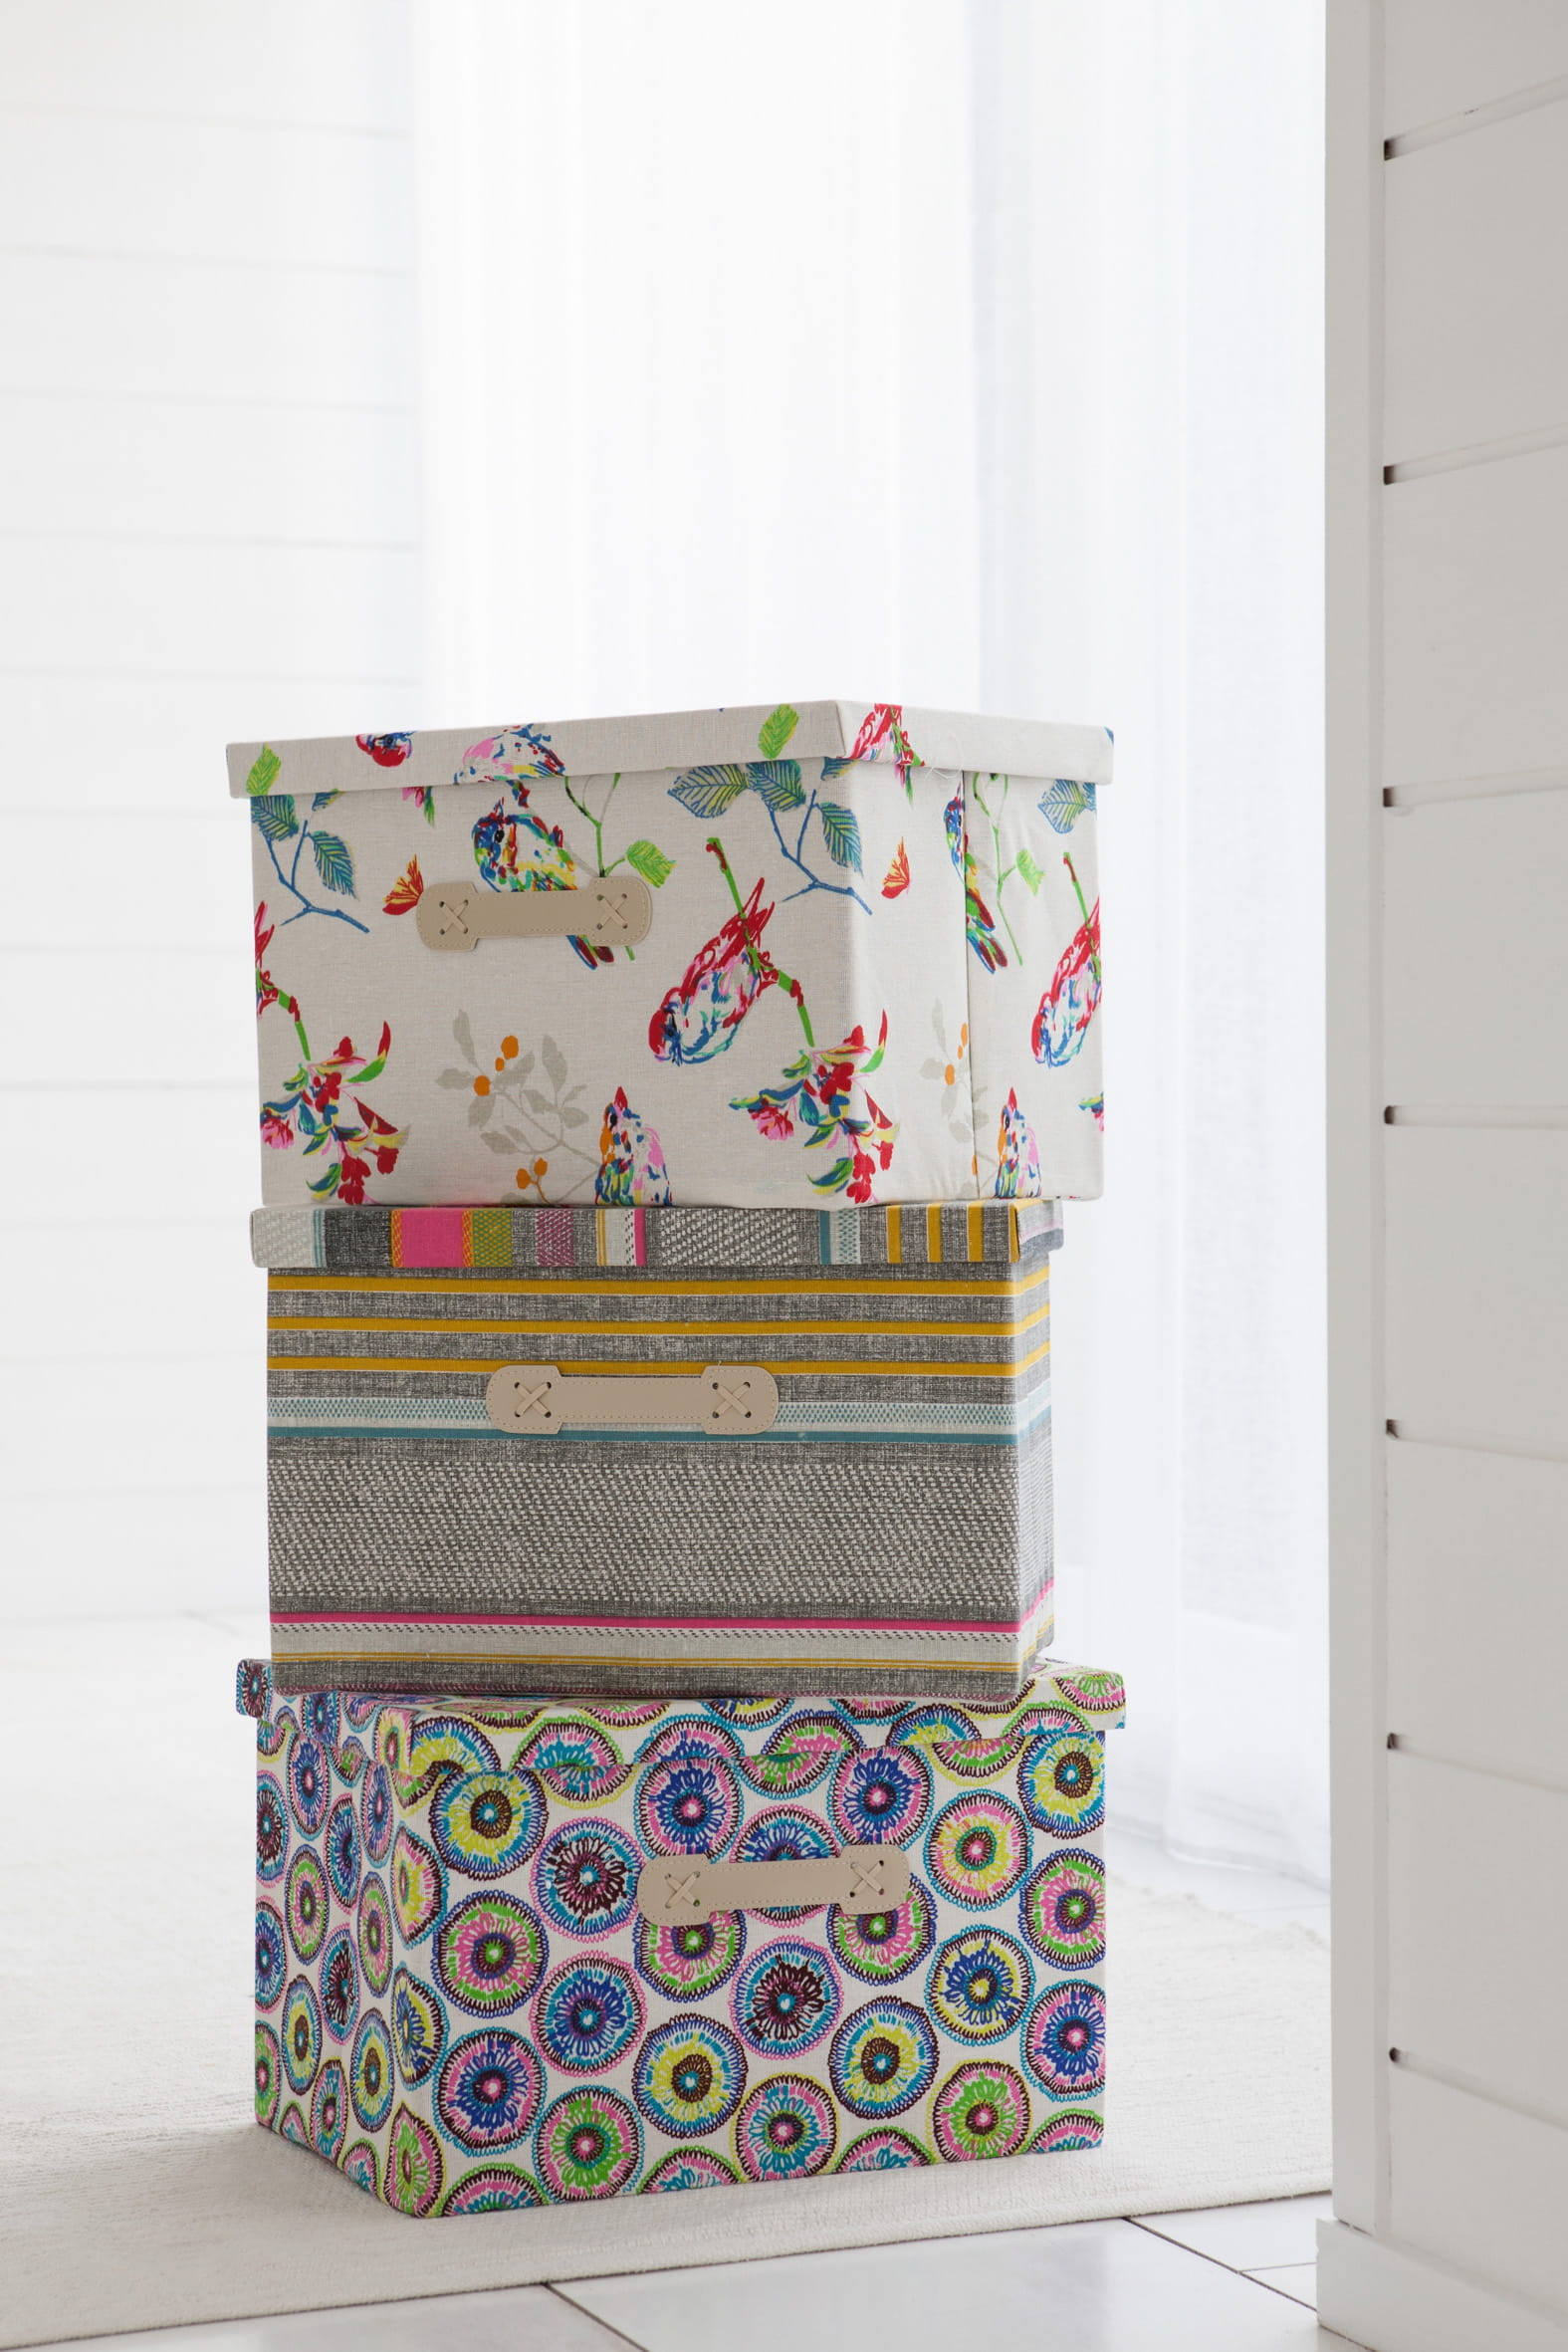 set de 3 bo tes d cor es par becquet jolies bo tes les alli es d co du rangement journal. Black Bedroom Furniture Sets. Home Design Ideas